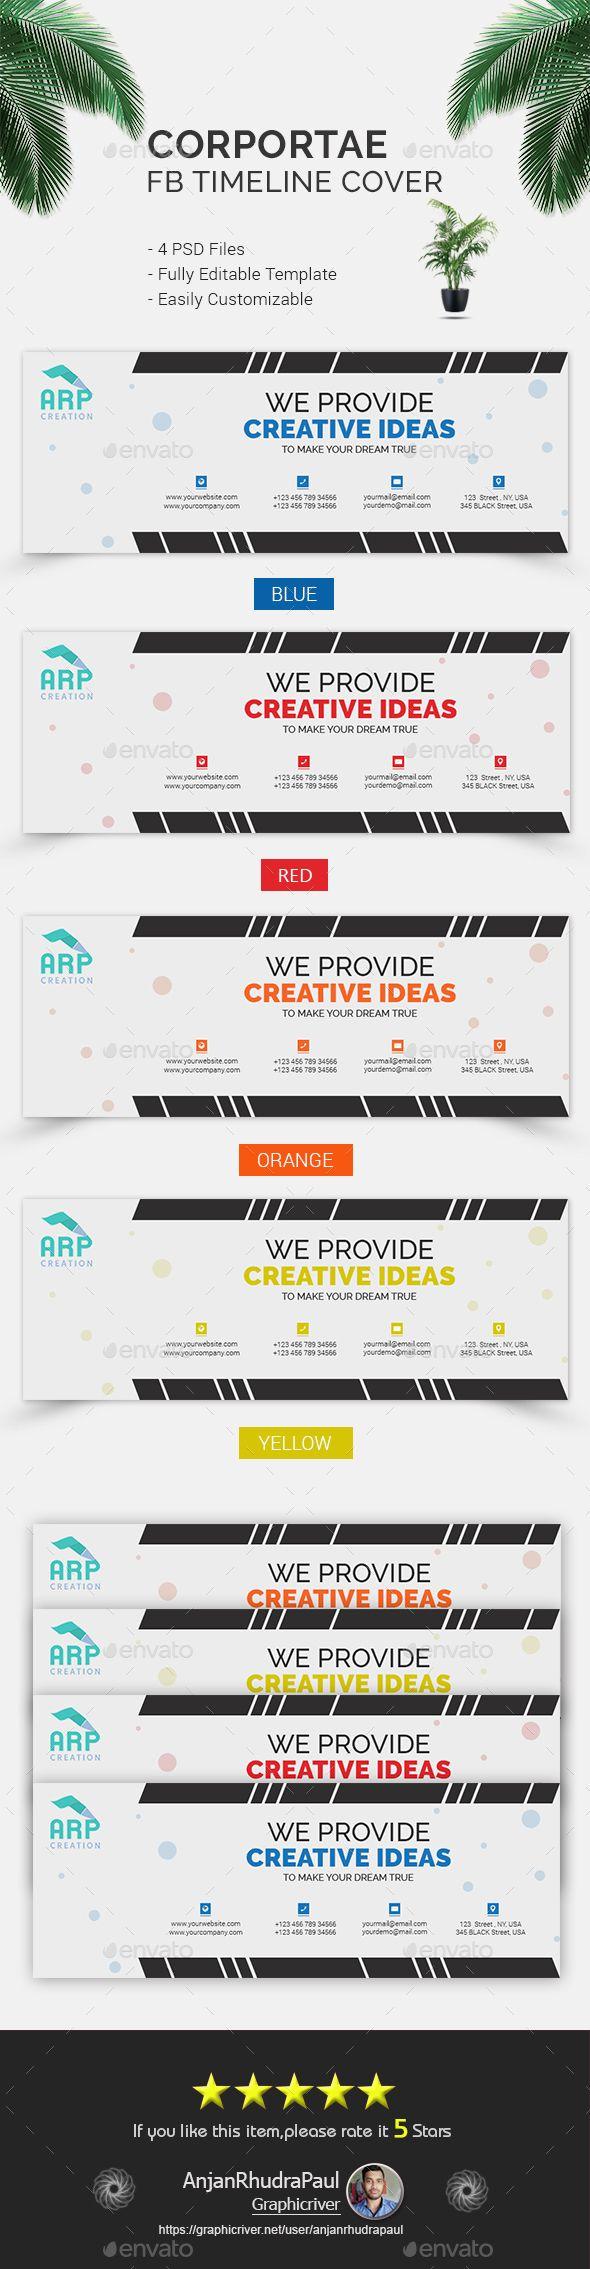 #Corporate FB Timeline Cover - Facebook Timeline Covers #Social #Media